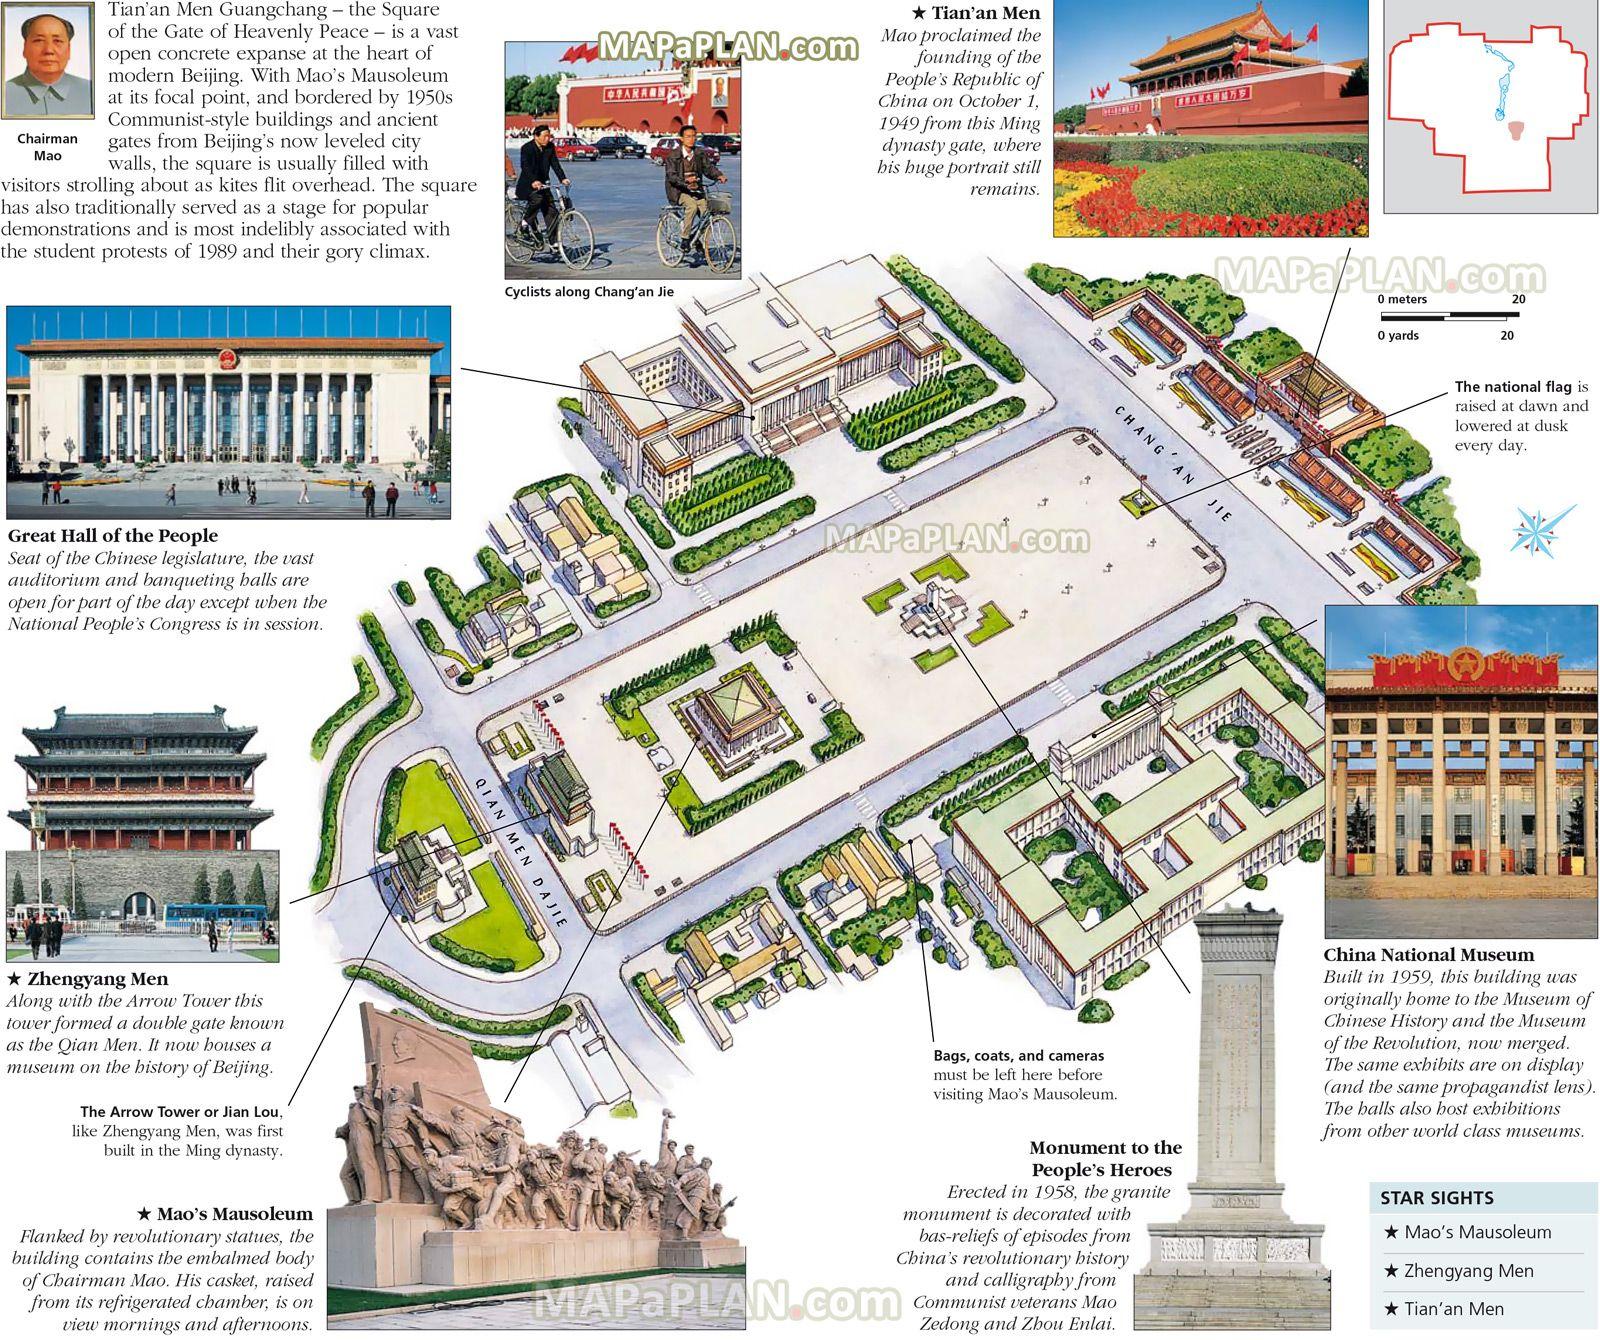 Tiananmen Square Walking Trip Itinerary Planner D Virtual - Walking map planner